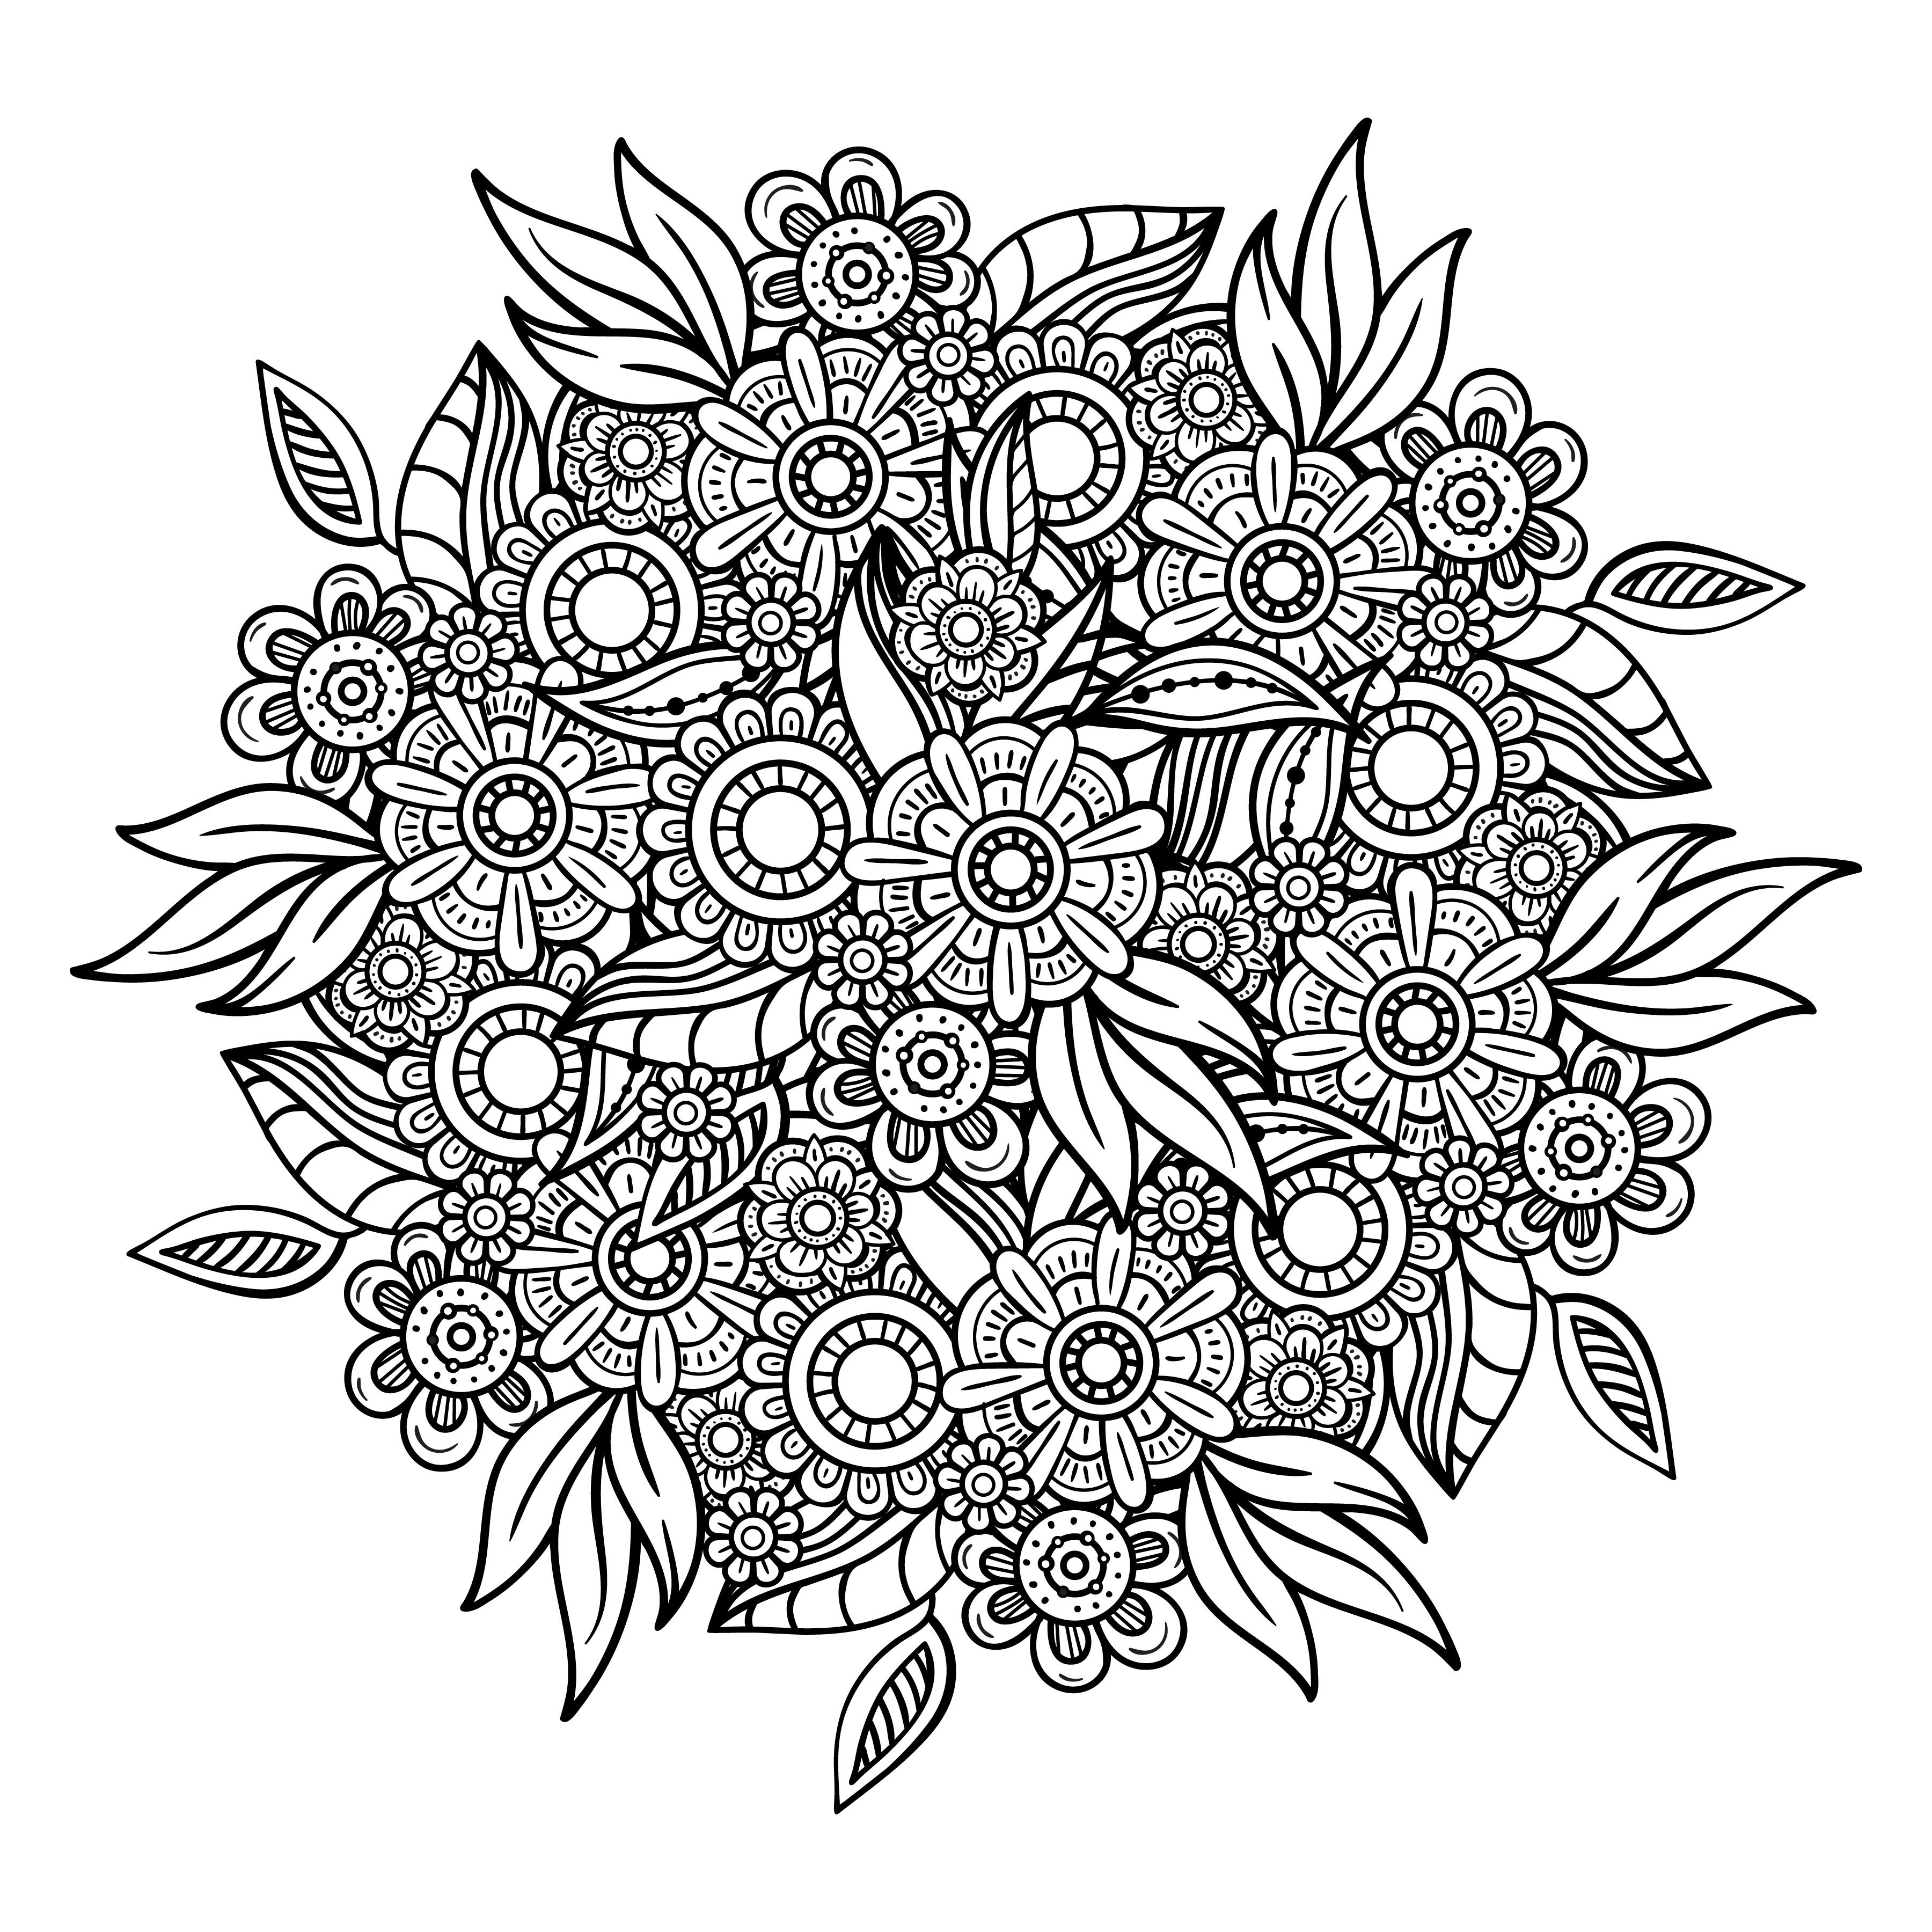 Floral Mandala Svg Zentangle Flowers Etsy In 2020 Zentangle Flowers Flower Coloring Pages Coloring Pages